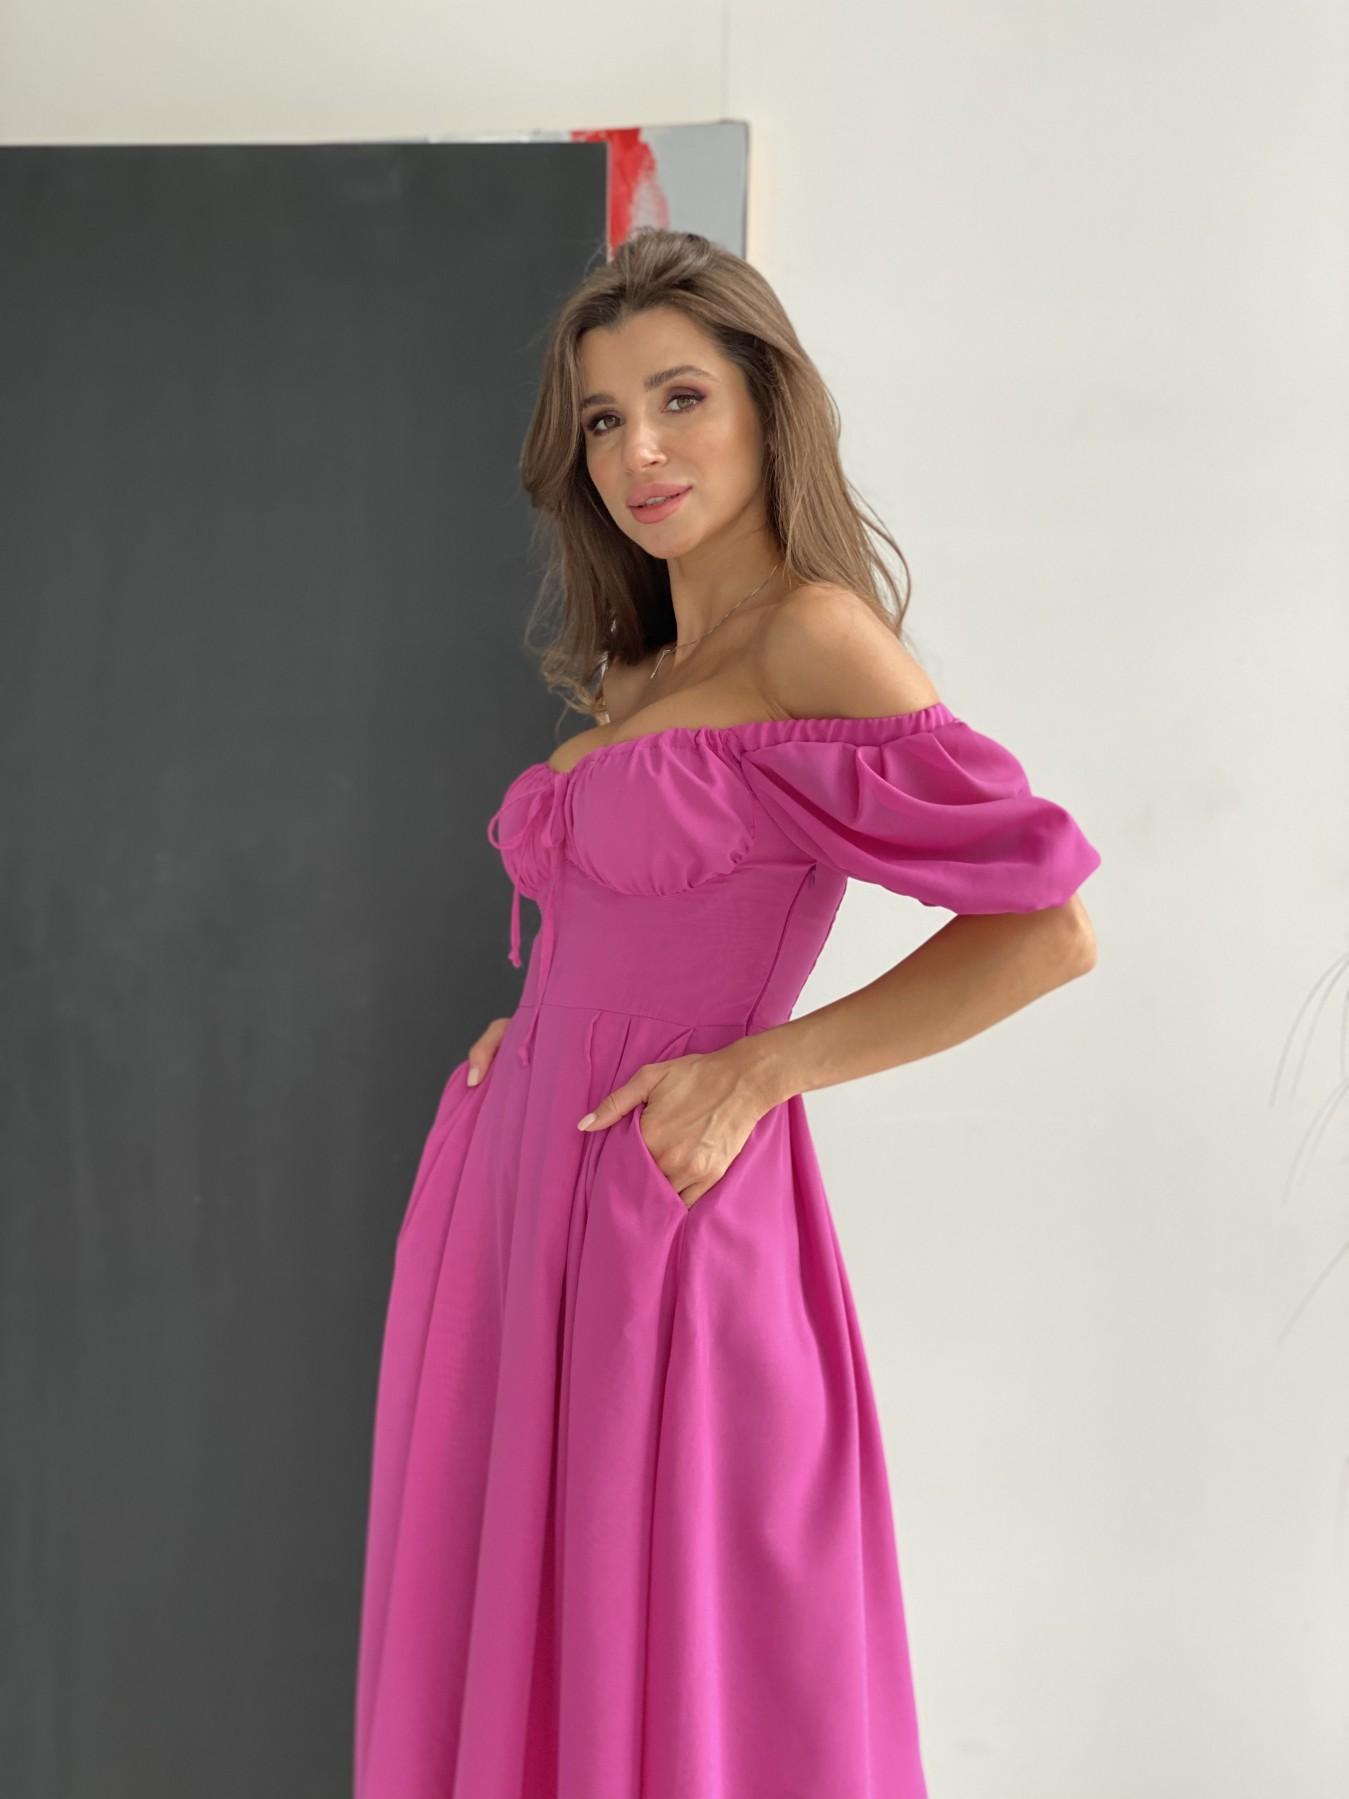 Кисес Миди платье шифон Микро однотонный 11603 АРТ. 48282 Цвет: Фуксия 16 - фото 3, интернет магазин tm-modus.ru